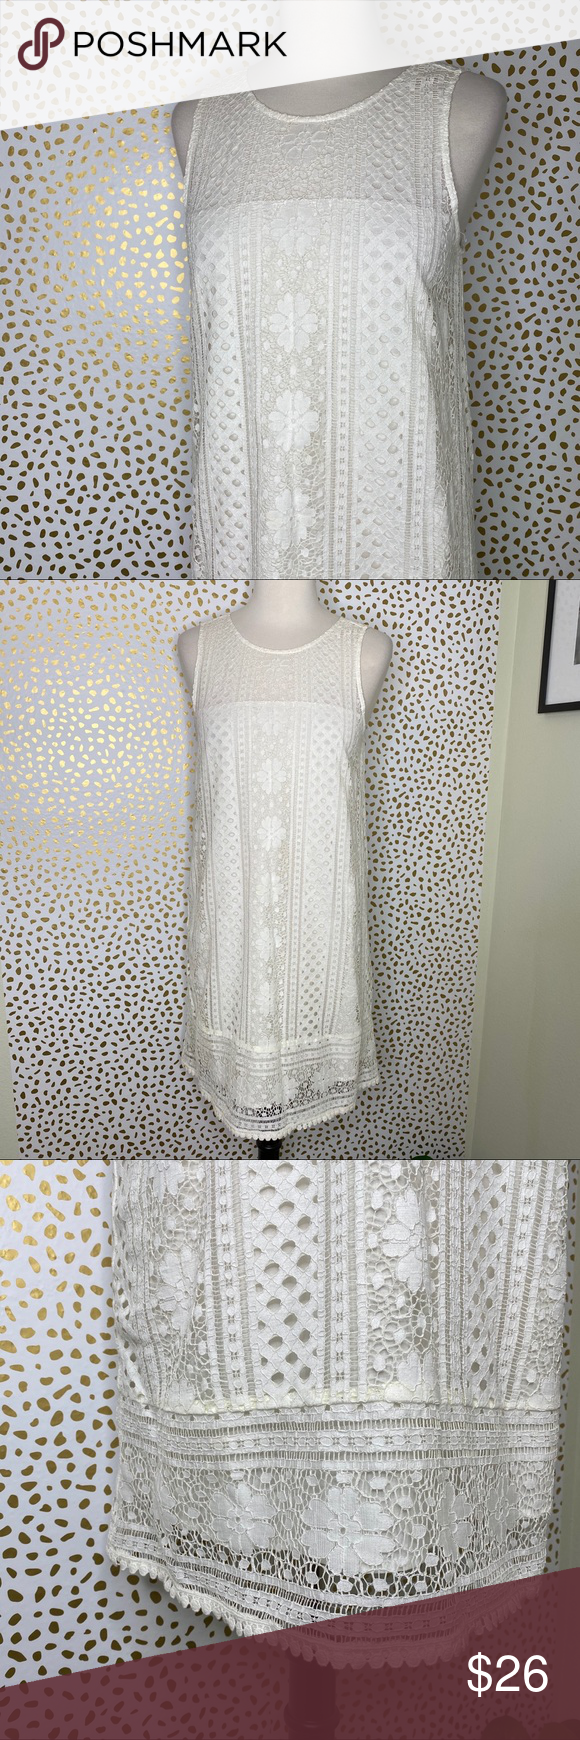 Cupcakes Cashmere White Lace Dress Lace White Dress Lace Overlay Dress White Lace [ 1740 x 580 Pixel ]